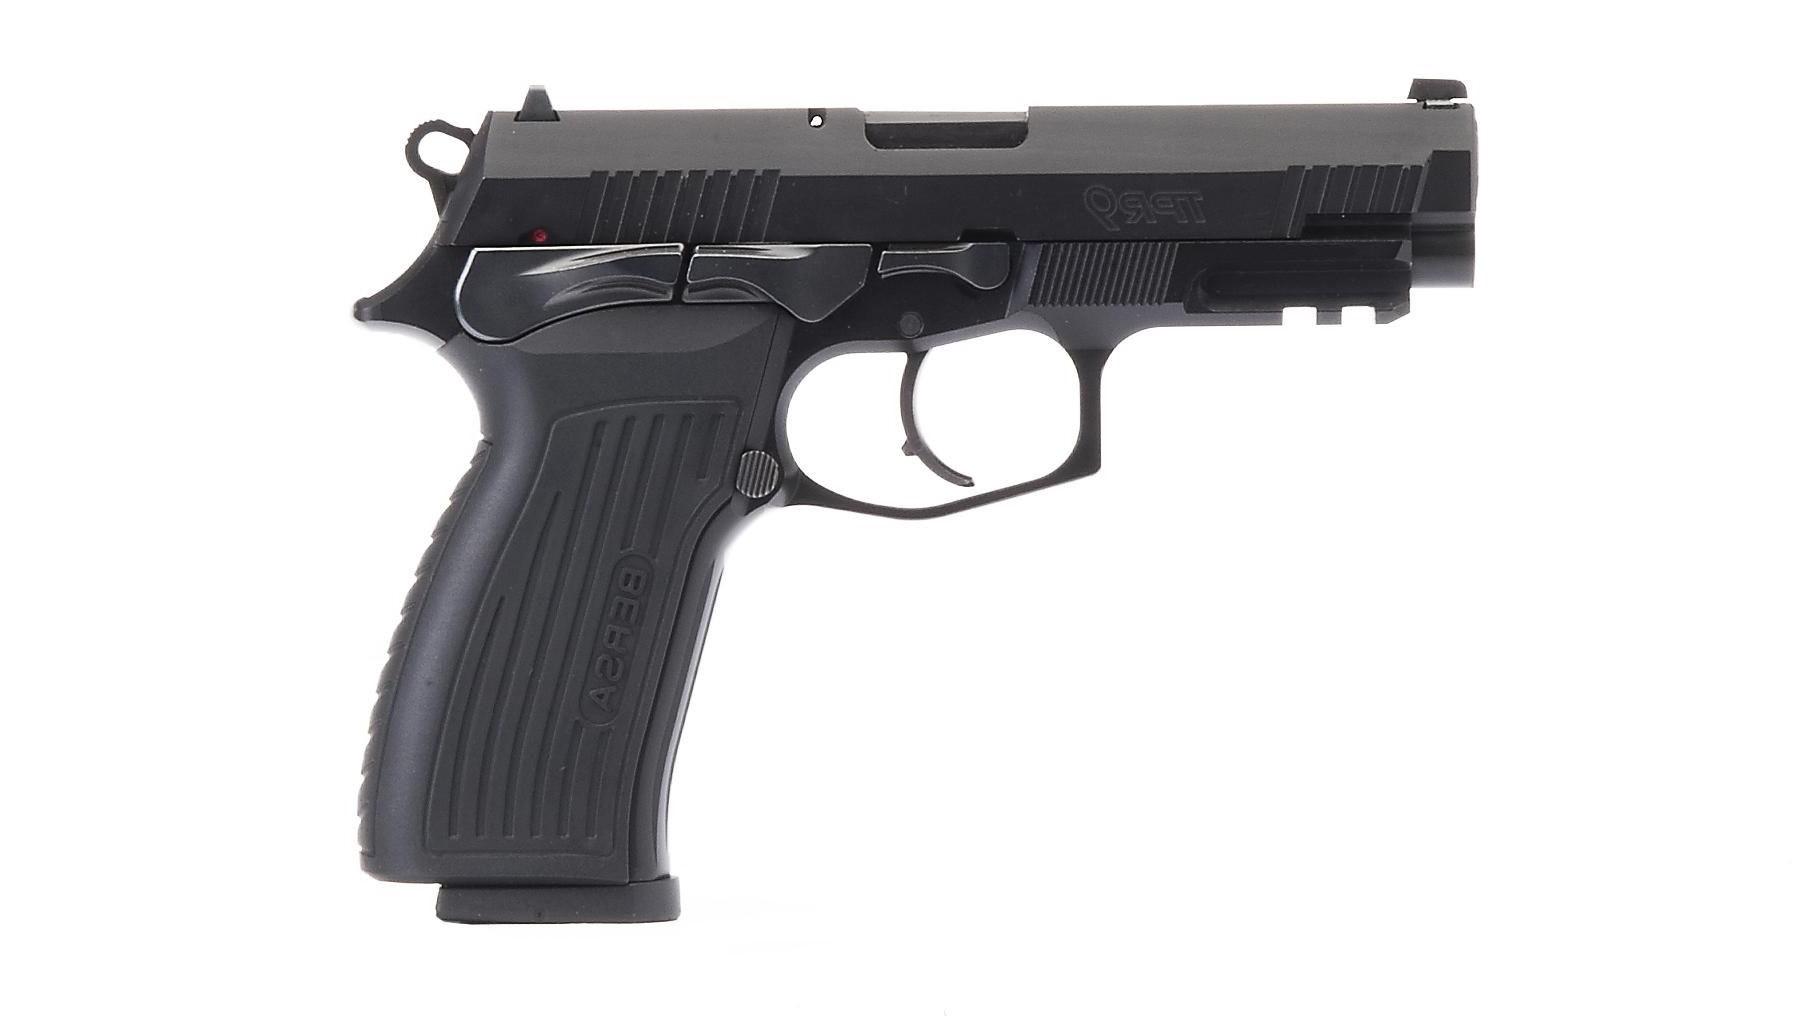 Pistola Bersa TPR9 - .9mm - 17 Tiros - Oxidada